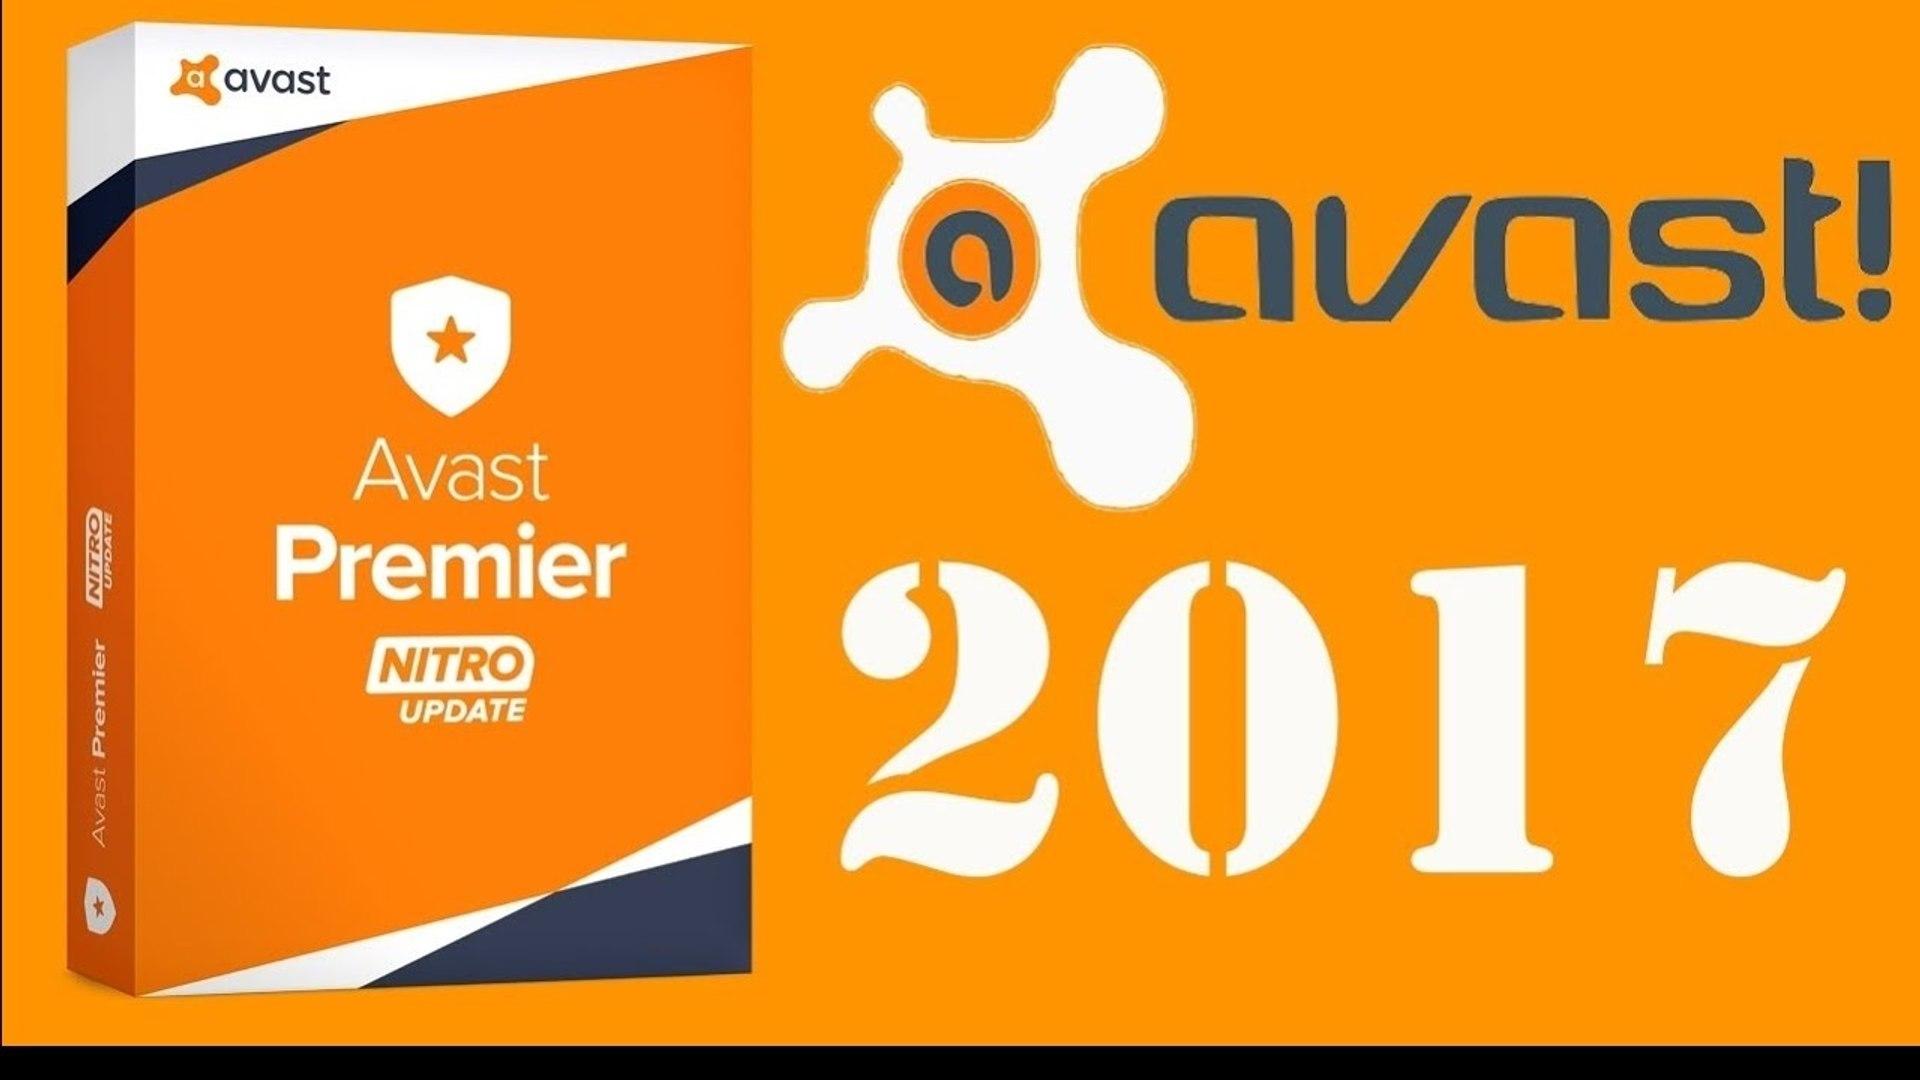 Avast Crack Antivirus 2017 Avast Premier 2017 Licence Key Full Download